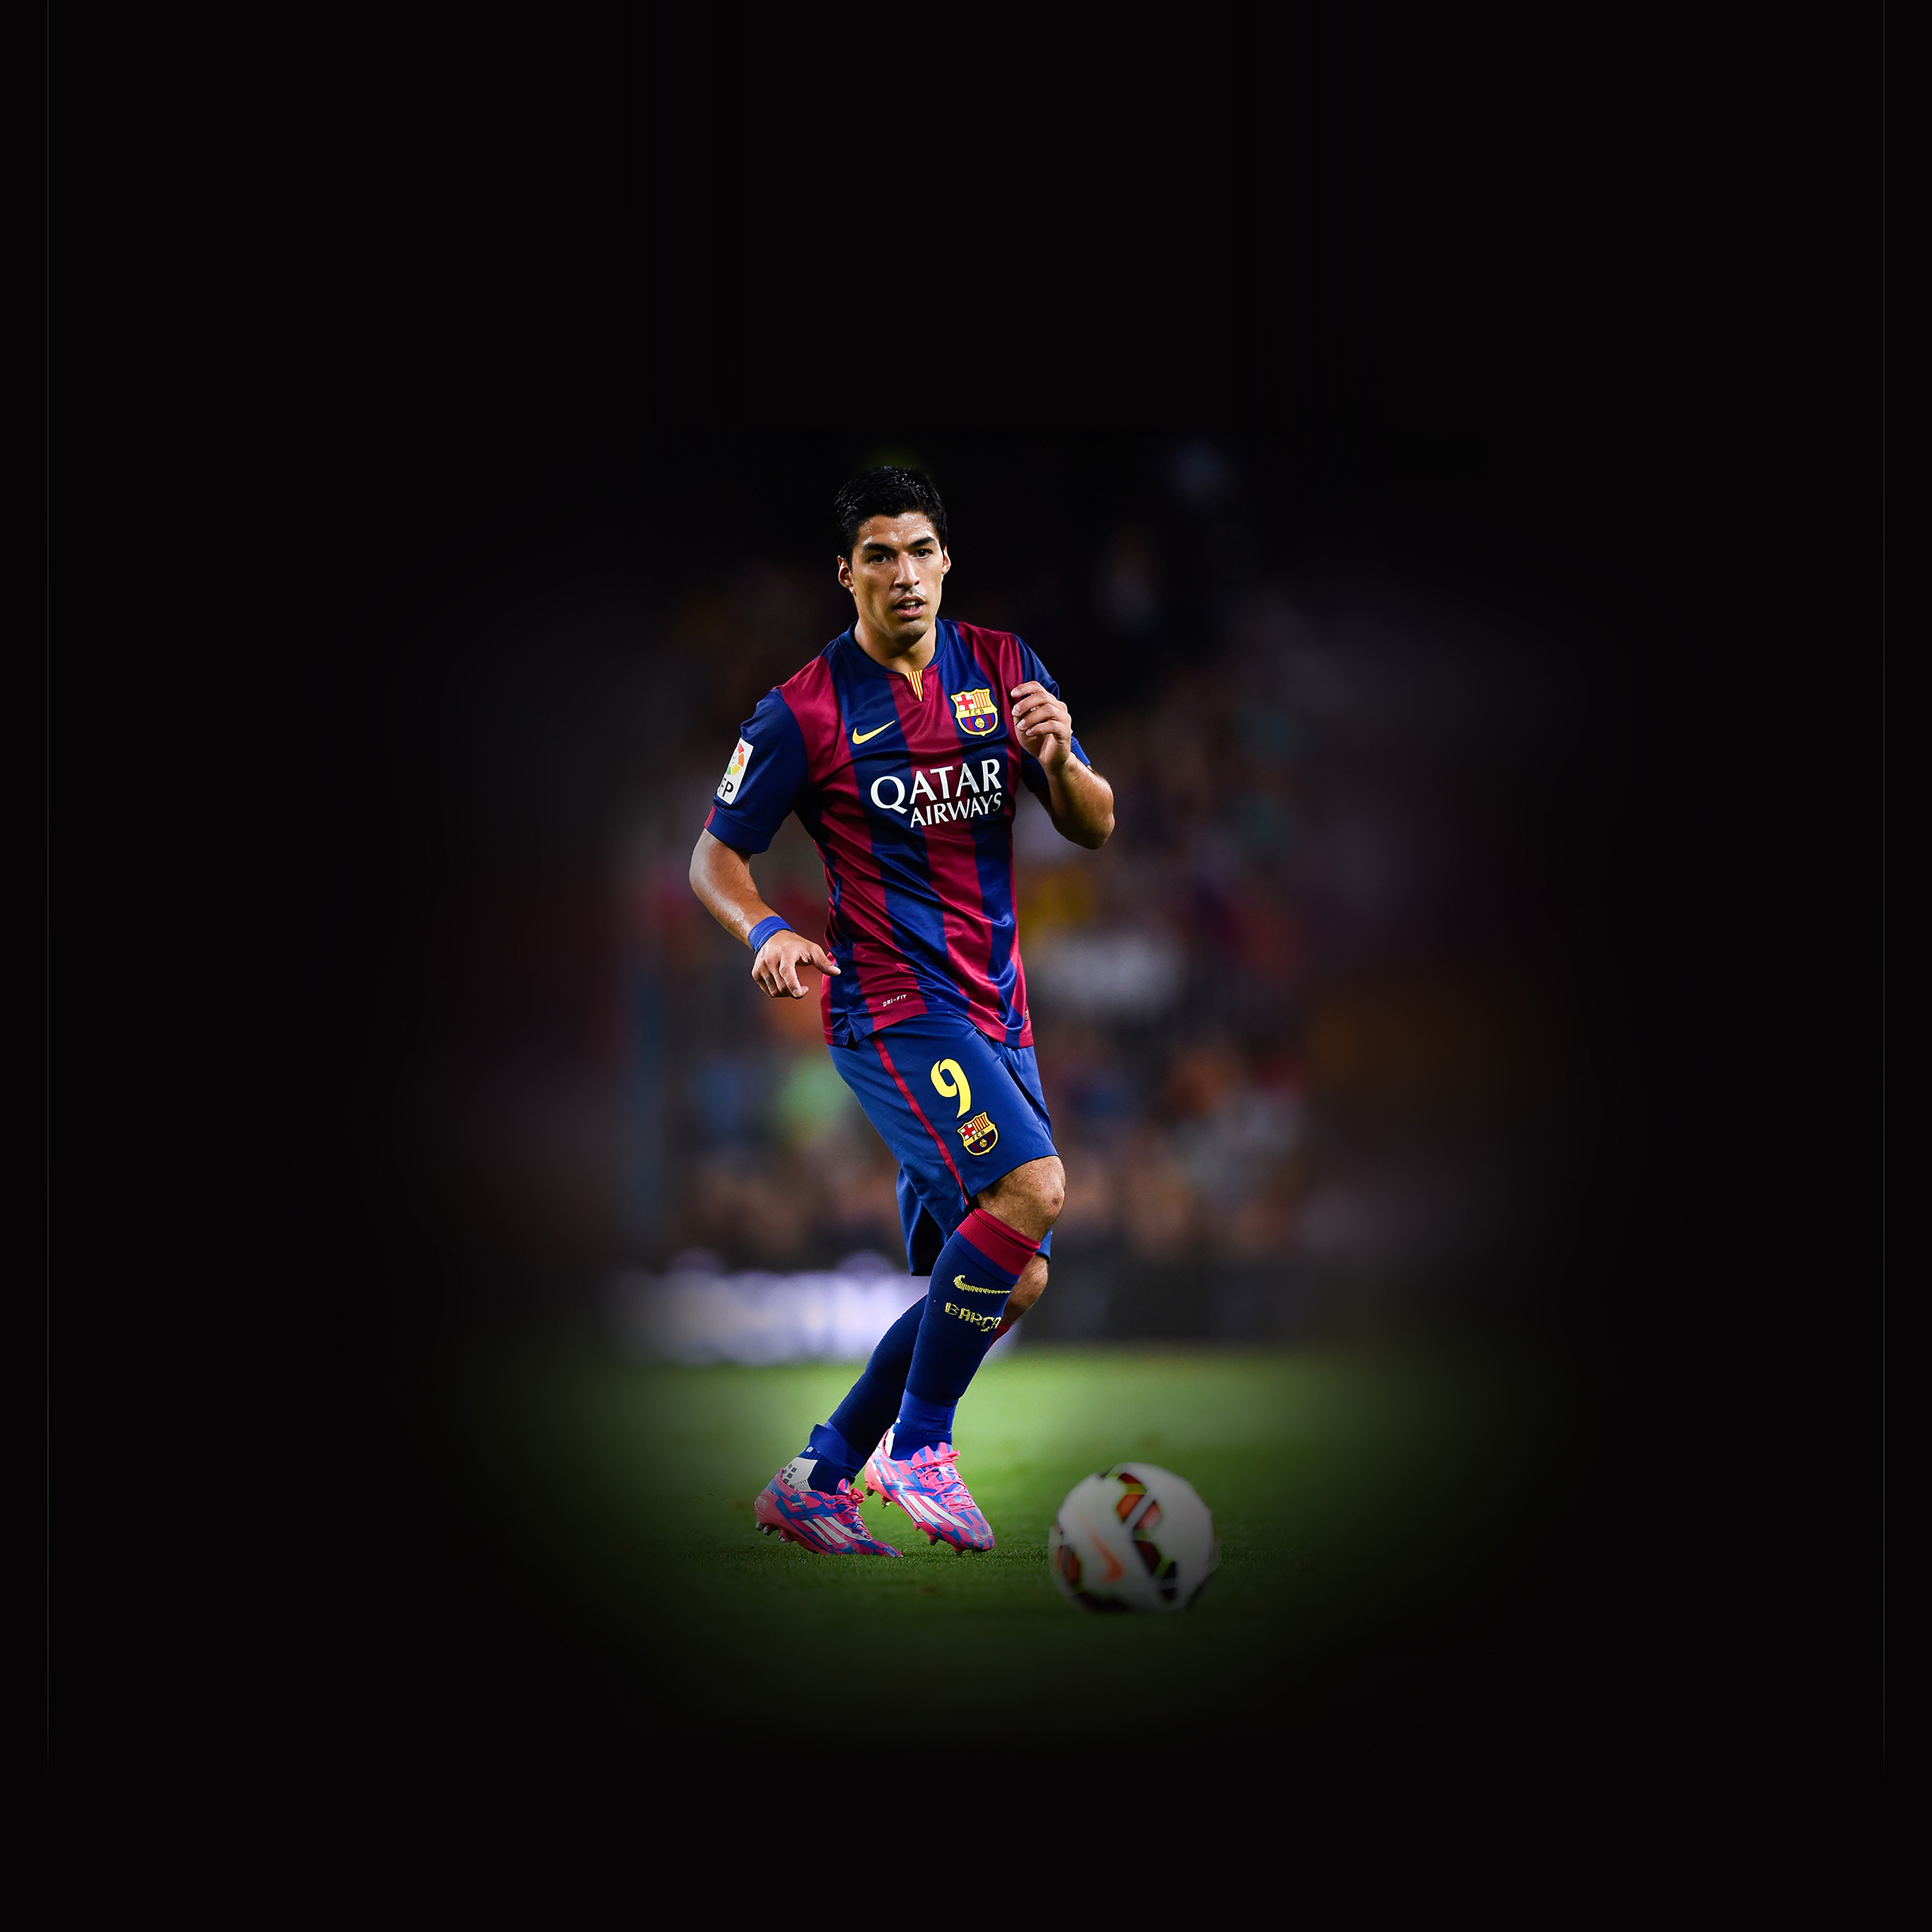 Hc52-suarez-barcelona-welcome-el-clasico-soccer